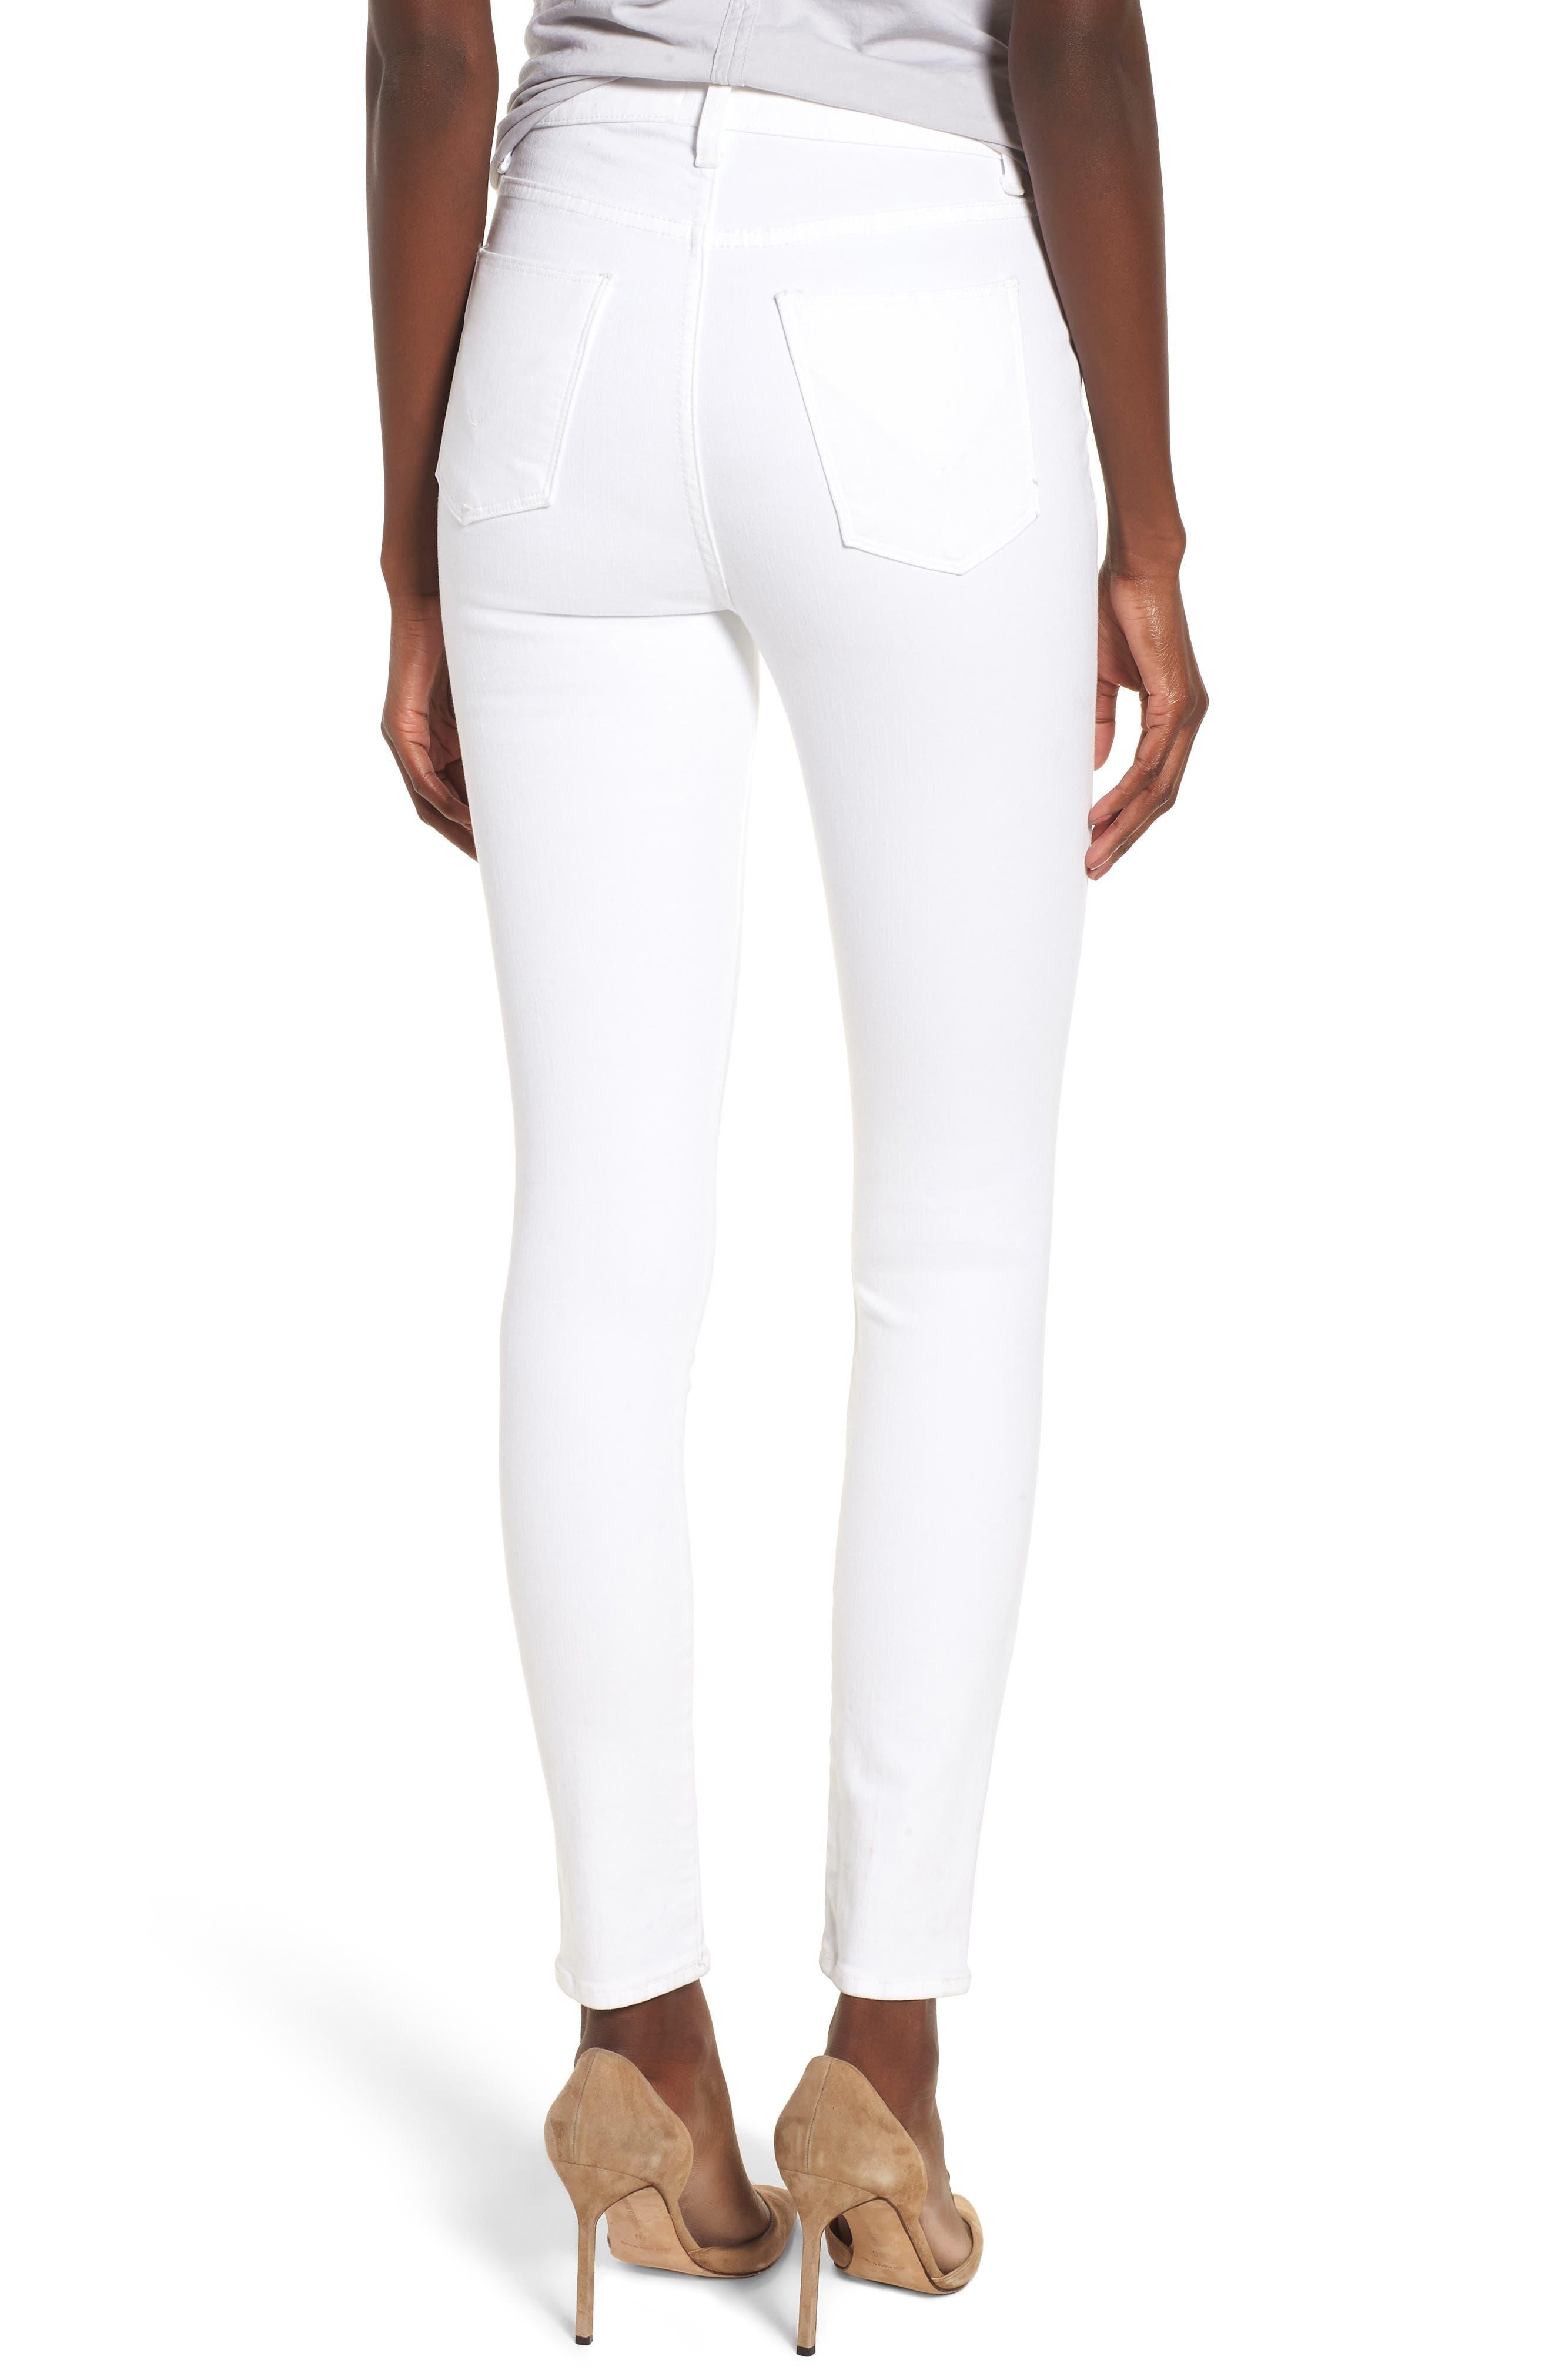 HUDSON JEANS,                             Bullocks Lace-Up High Waist Super Skinny Jeans,                             Alternate thumbnail 2, color,                             110